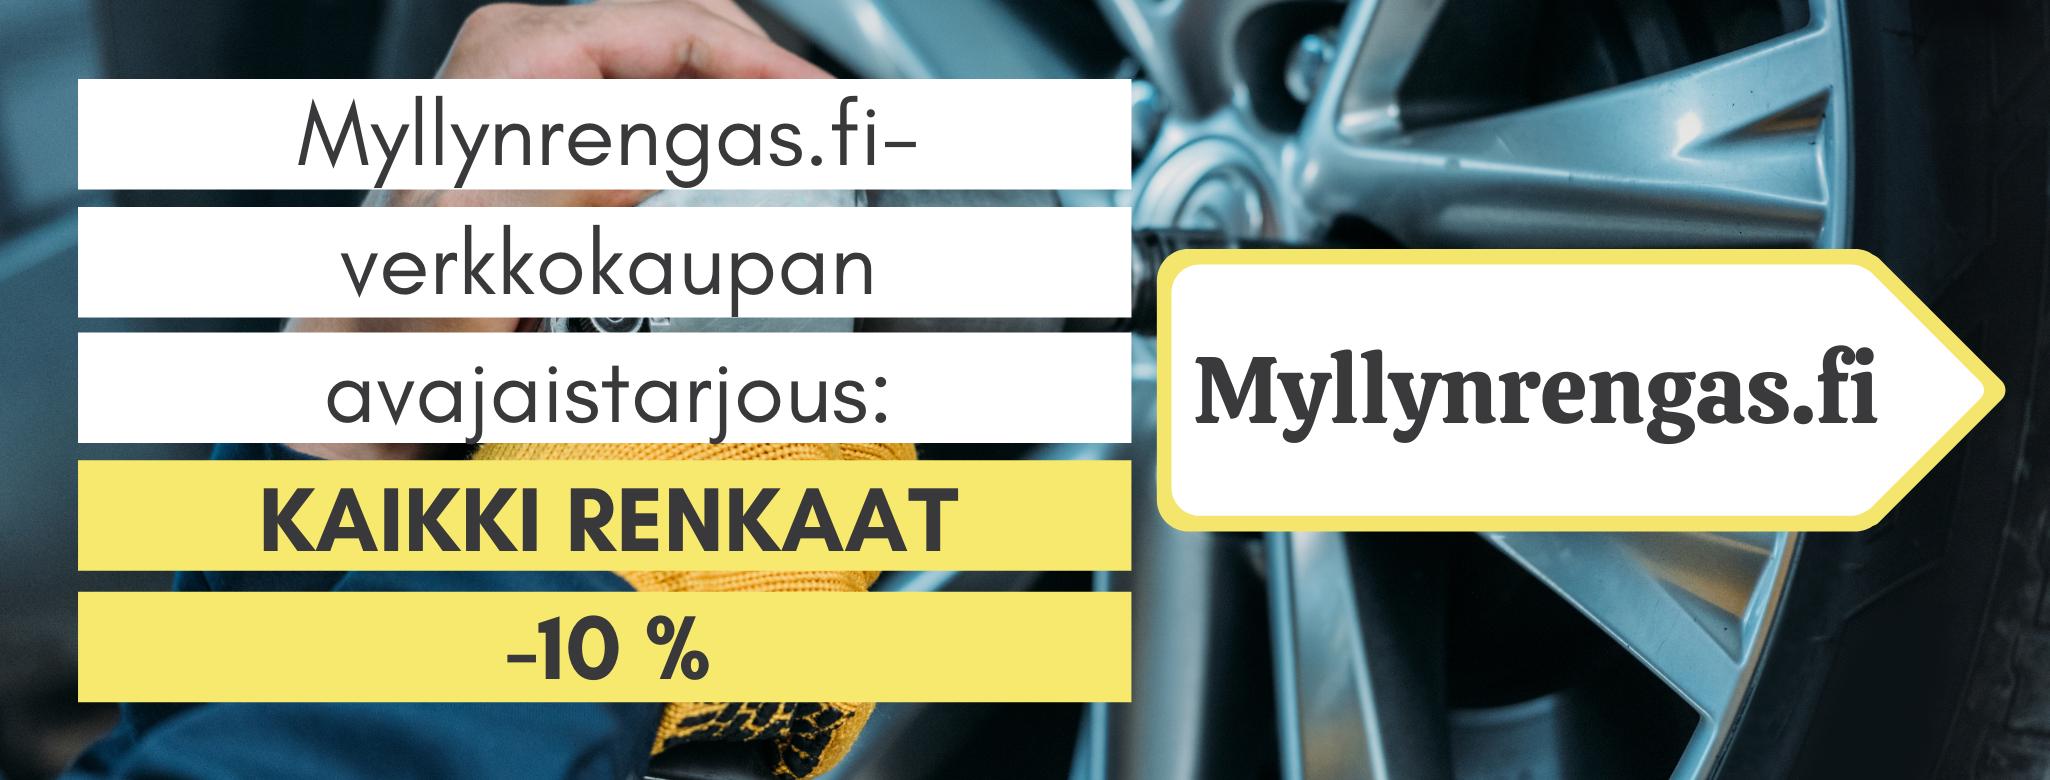 Myllynrengas.fi avajaistarjous - Myllyn Mies Oy